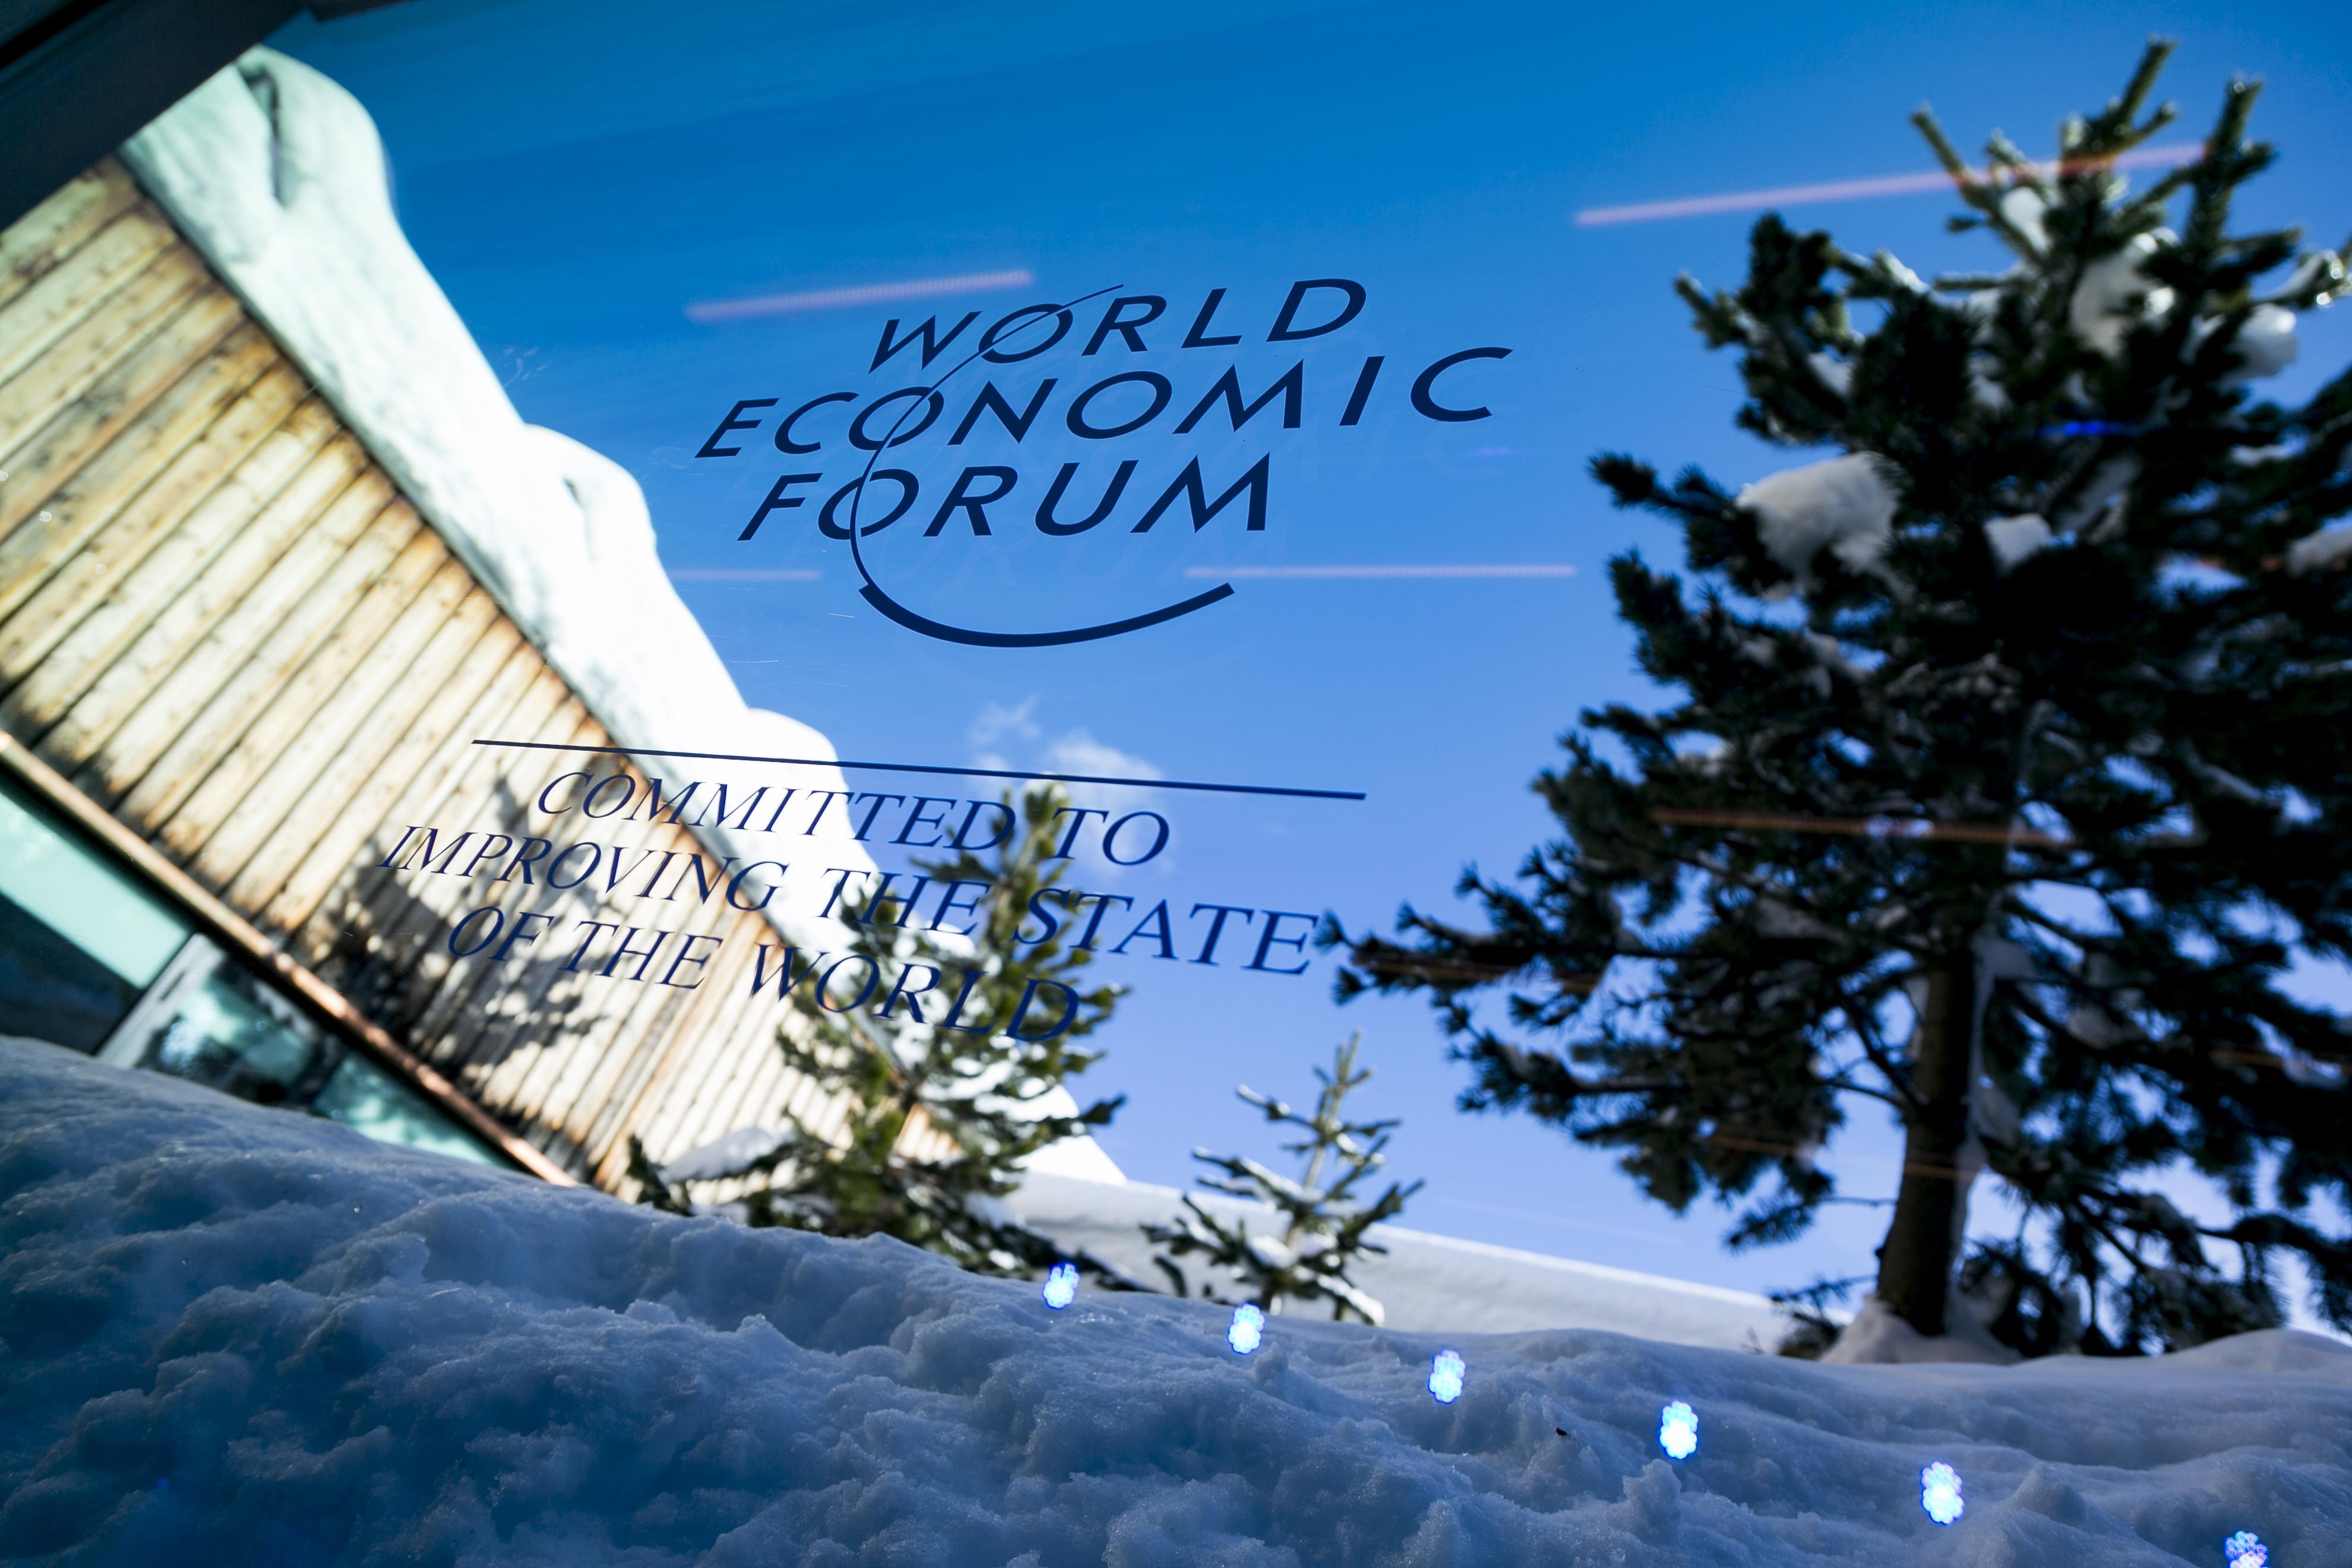 Davos Agenda World Economic Forum Environment Gender Equality Sustainability COVID-19 coronavirus stakeholder capitalism